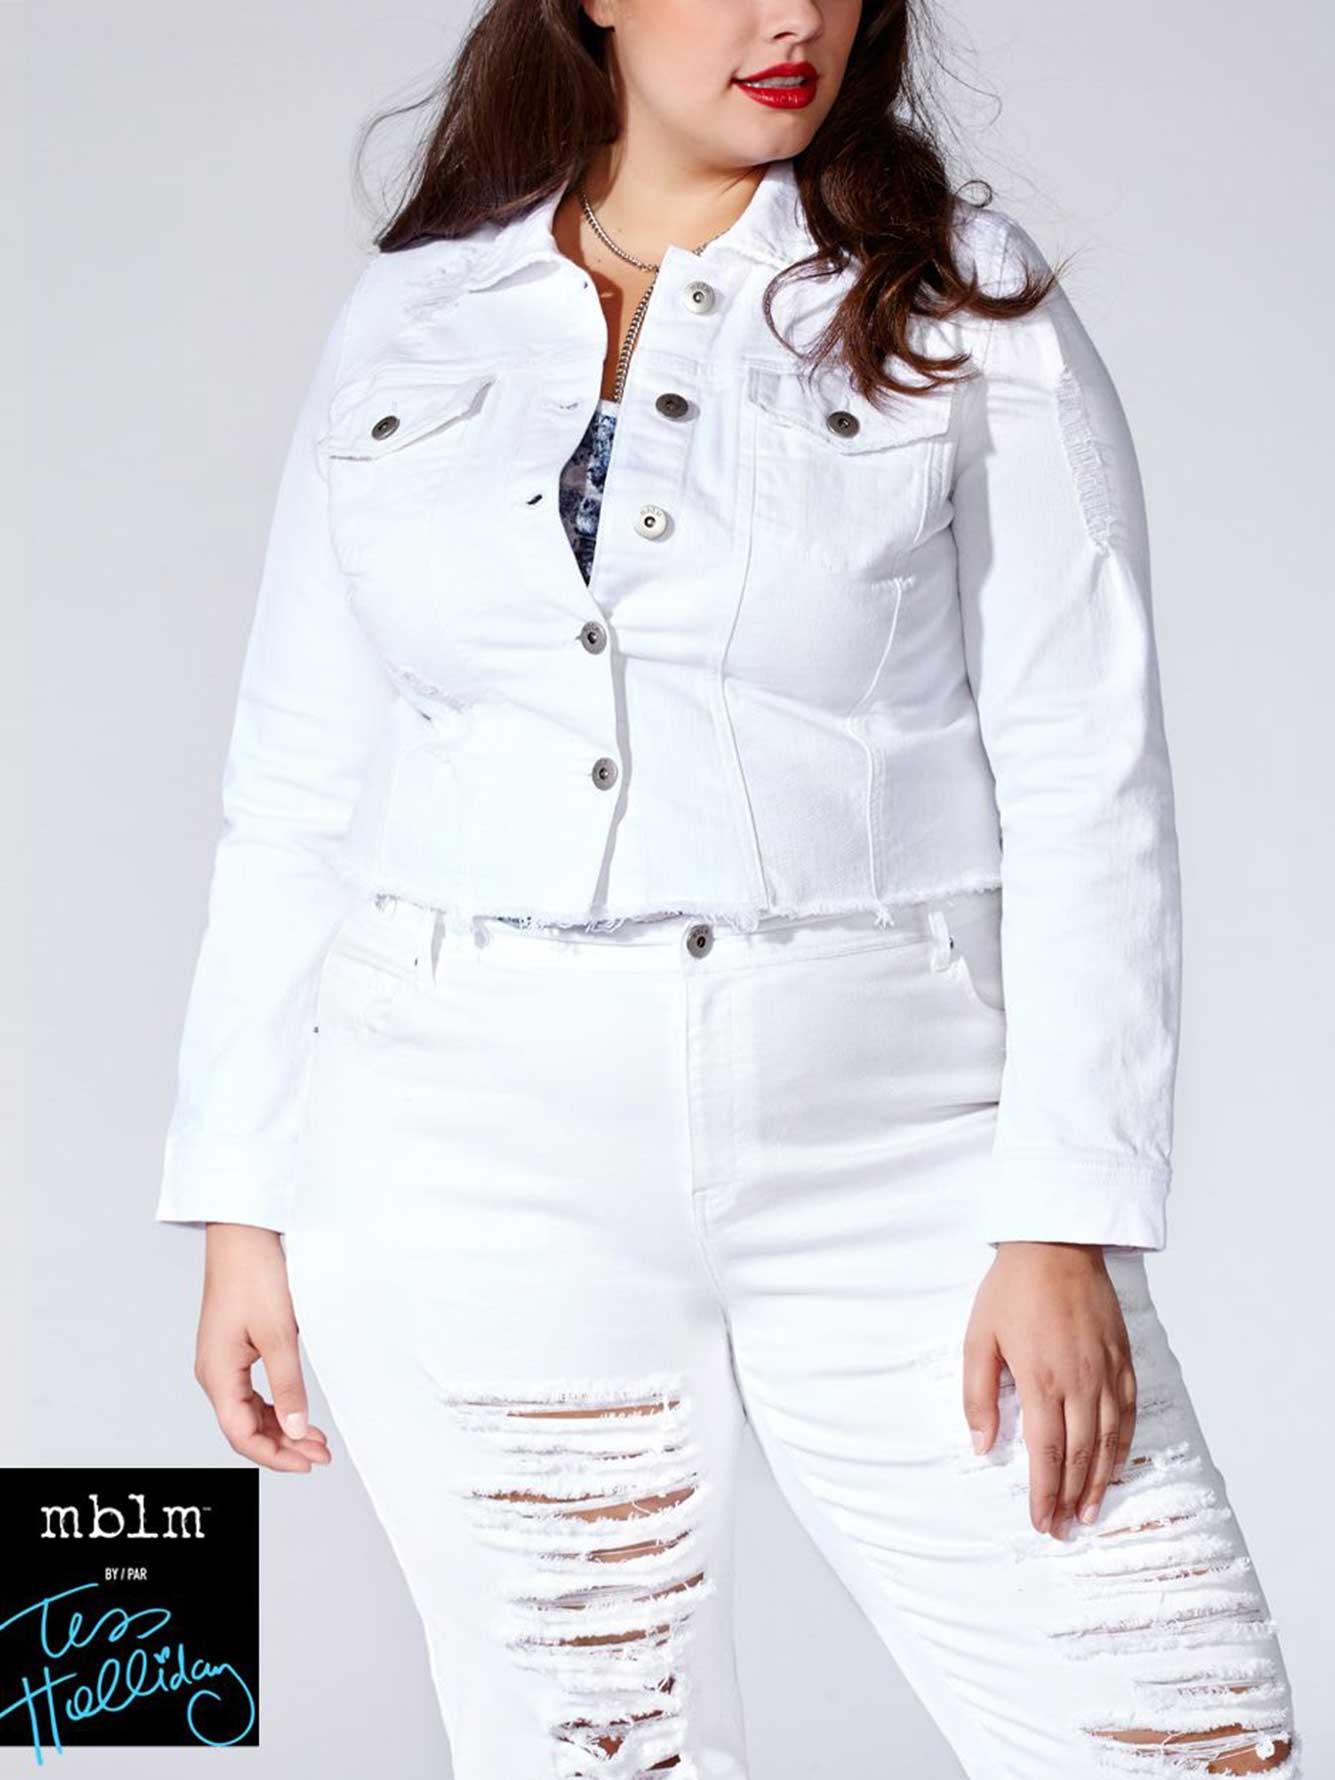 dd1c74df5de6 Tess Holliday - Cropped White Denim Jacket | Penningtons